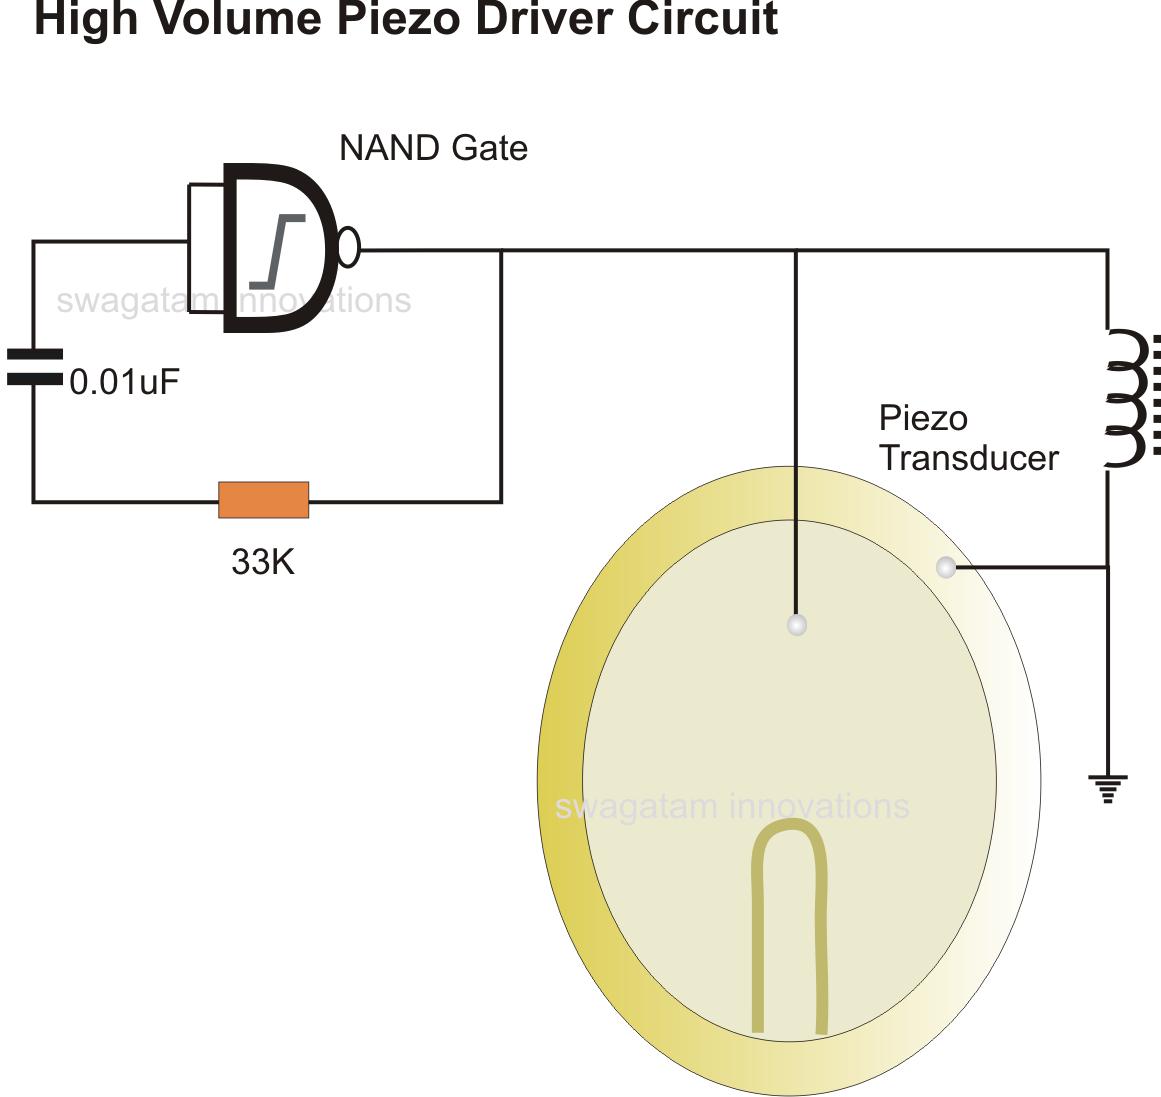 5 watt led driver circuit diagram 1974 vw beetle alternator wiring simplest piezo explained